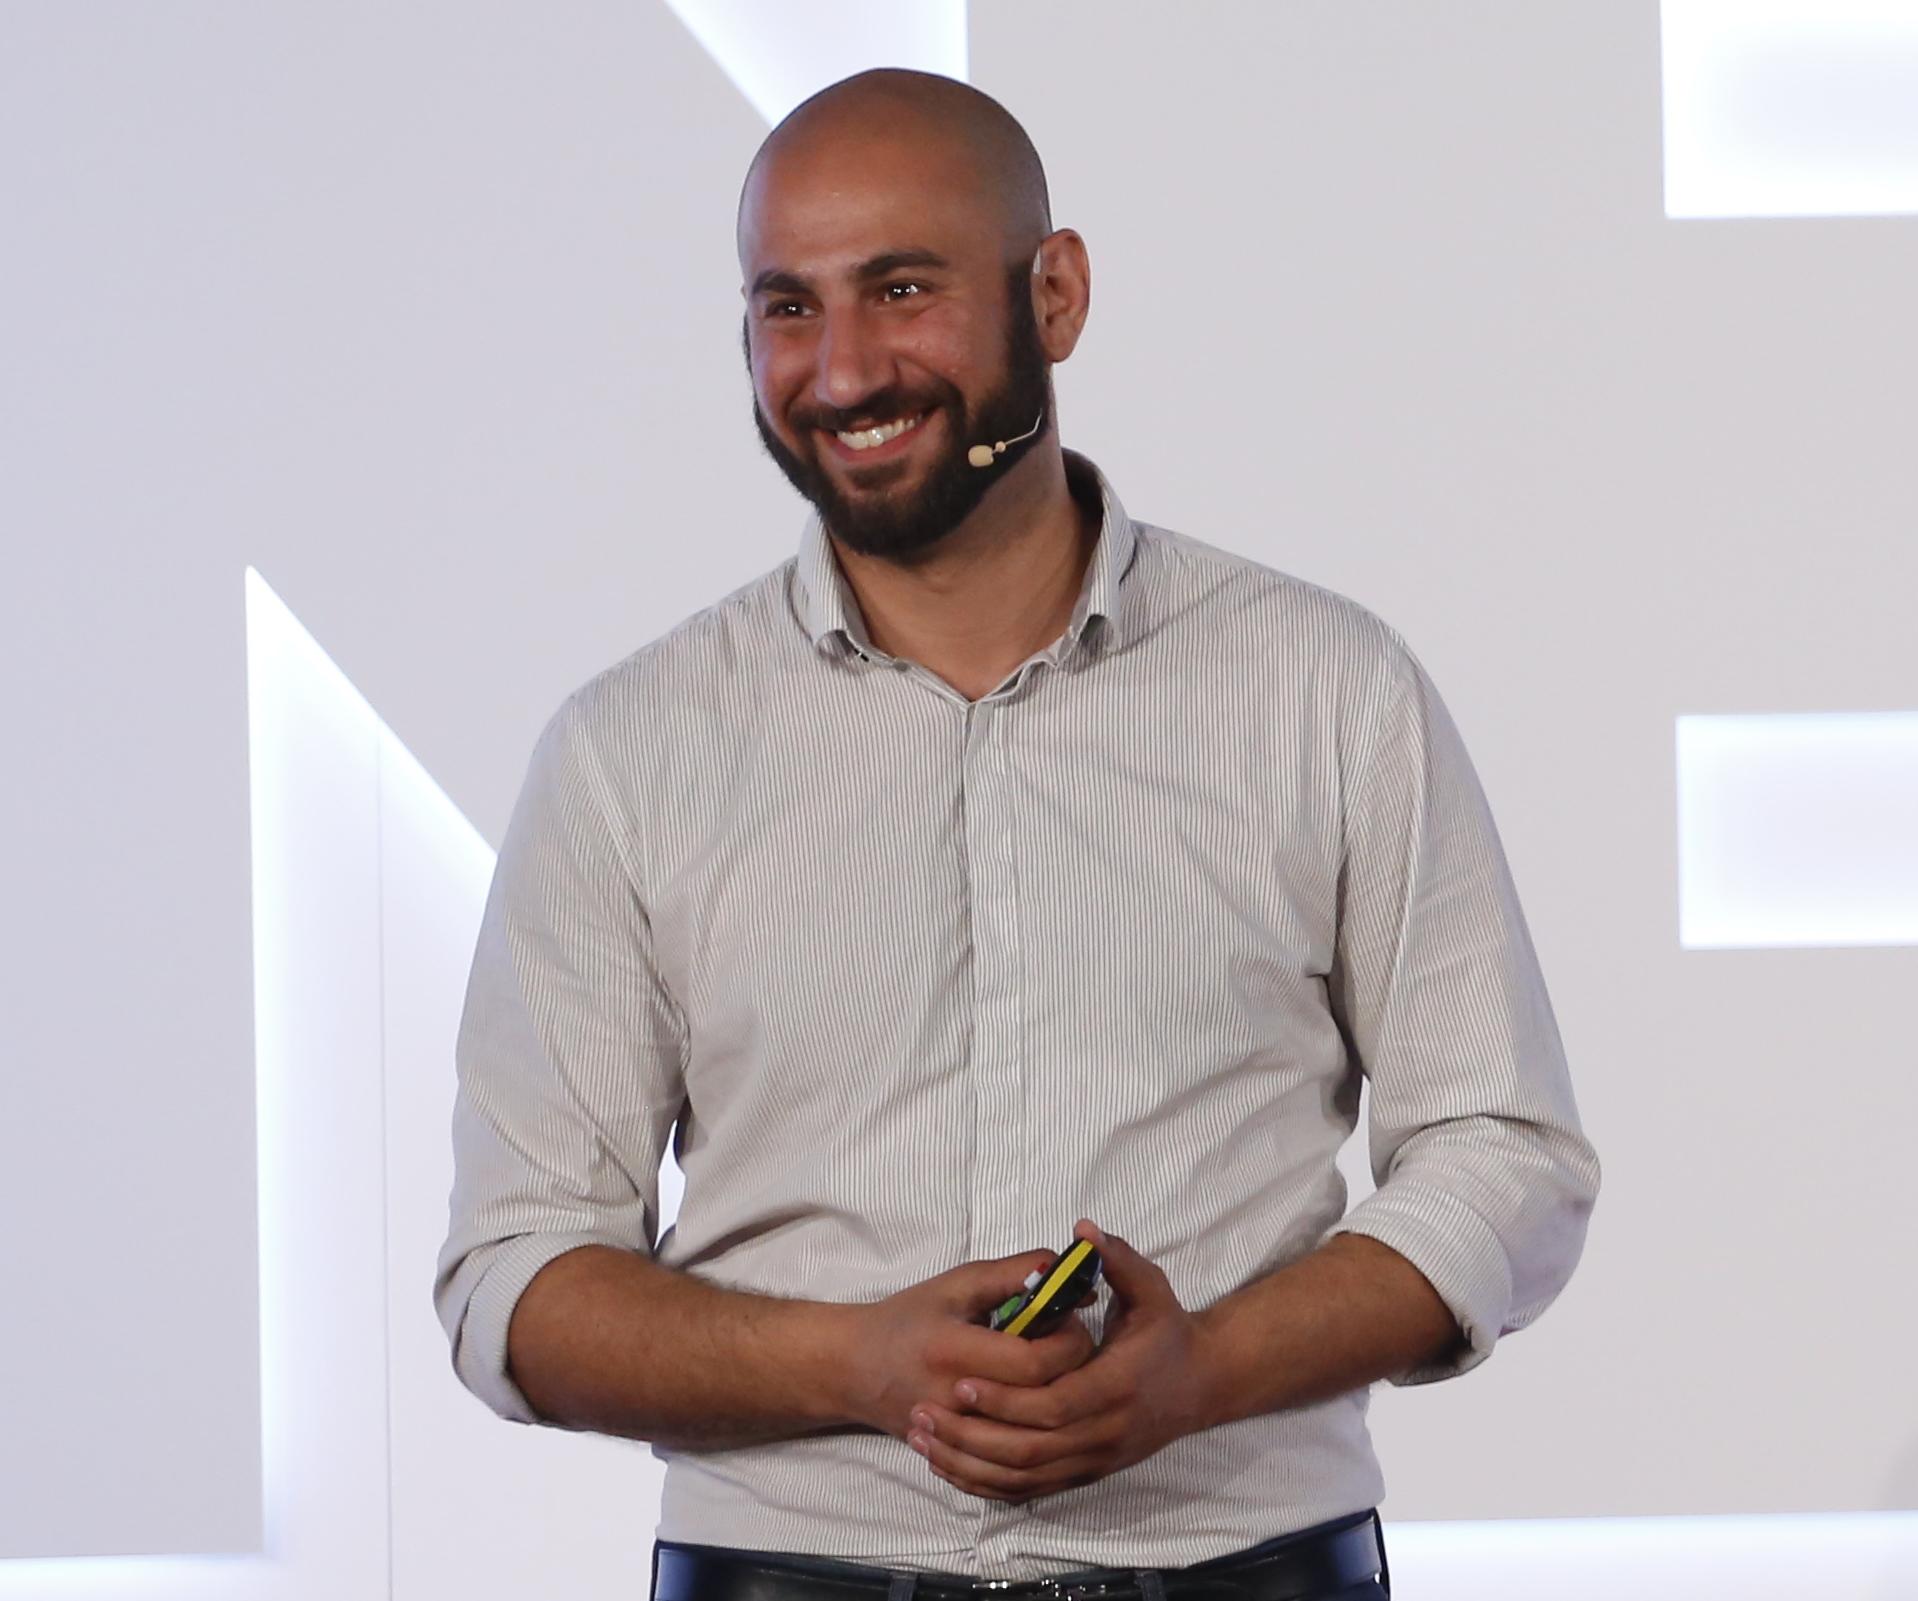 Arash Pendari